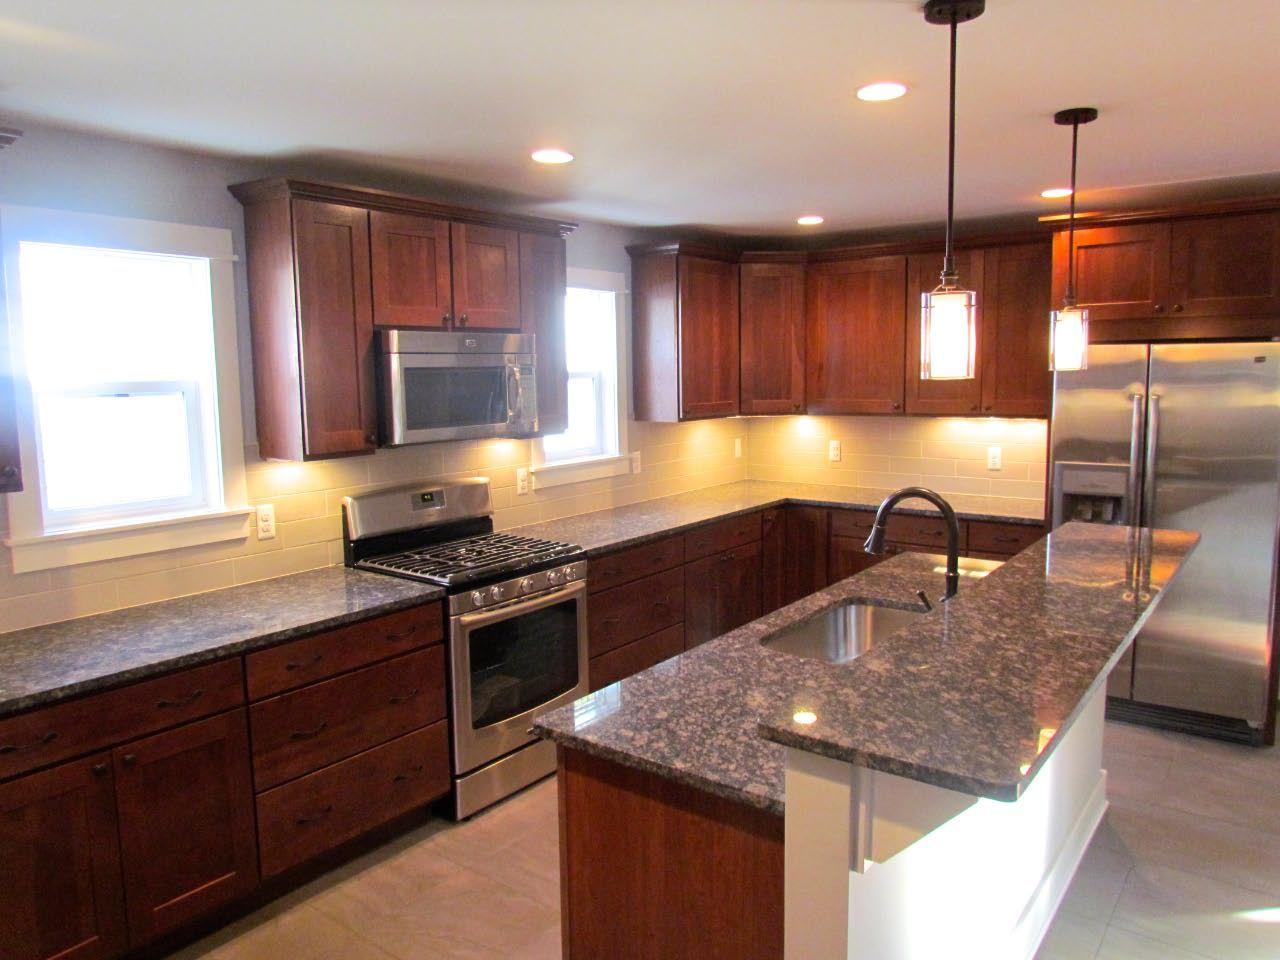 pinterest kitchen remodel ideas spotlights beautiful design home designs